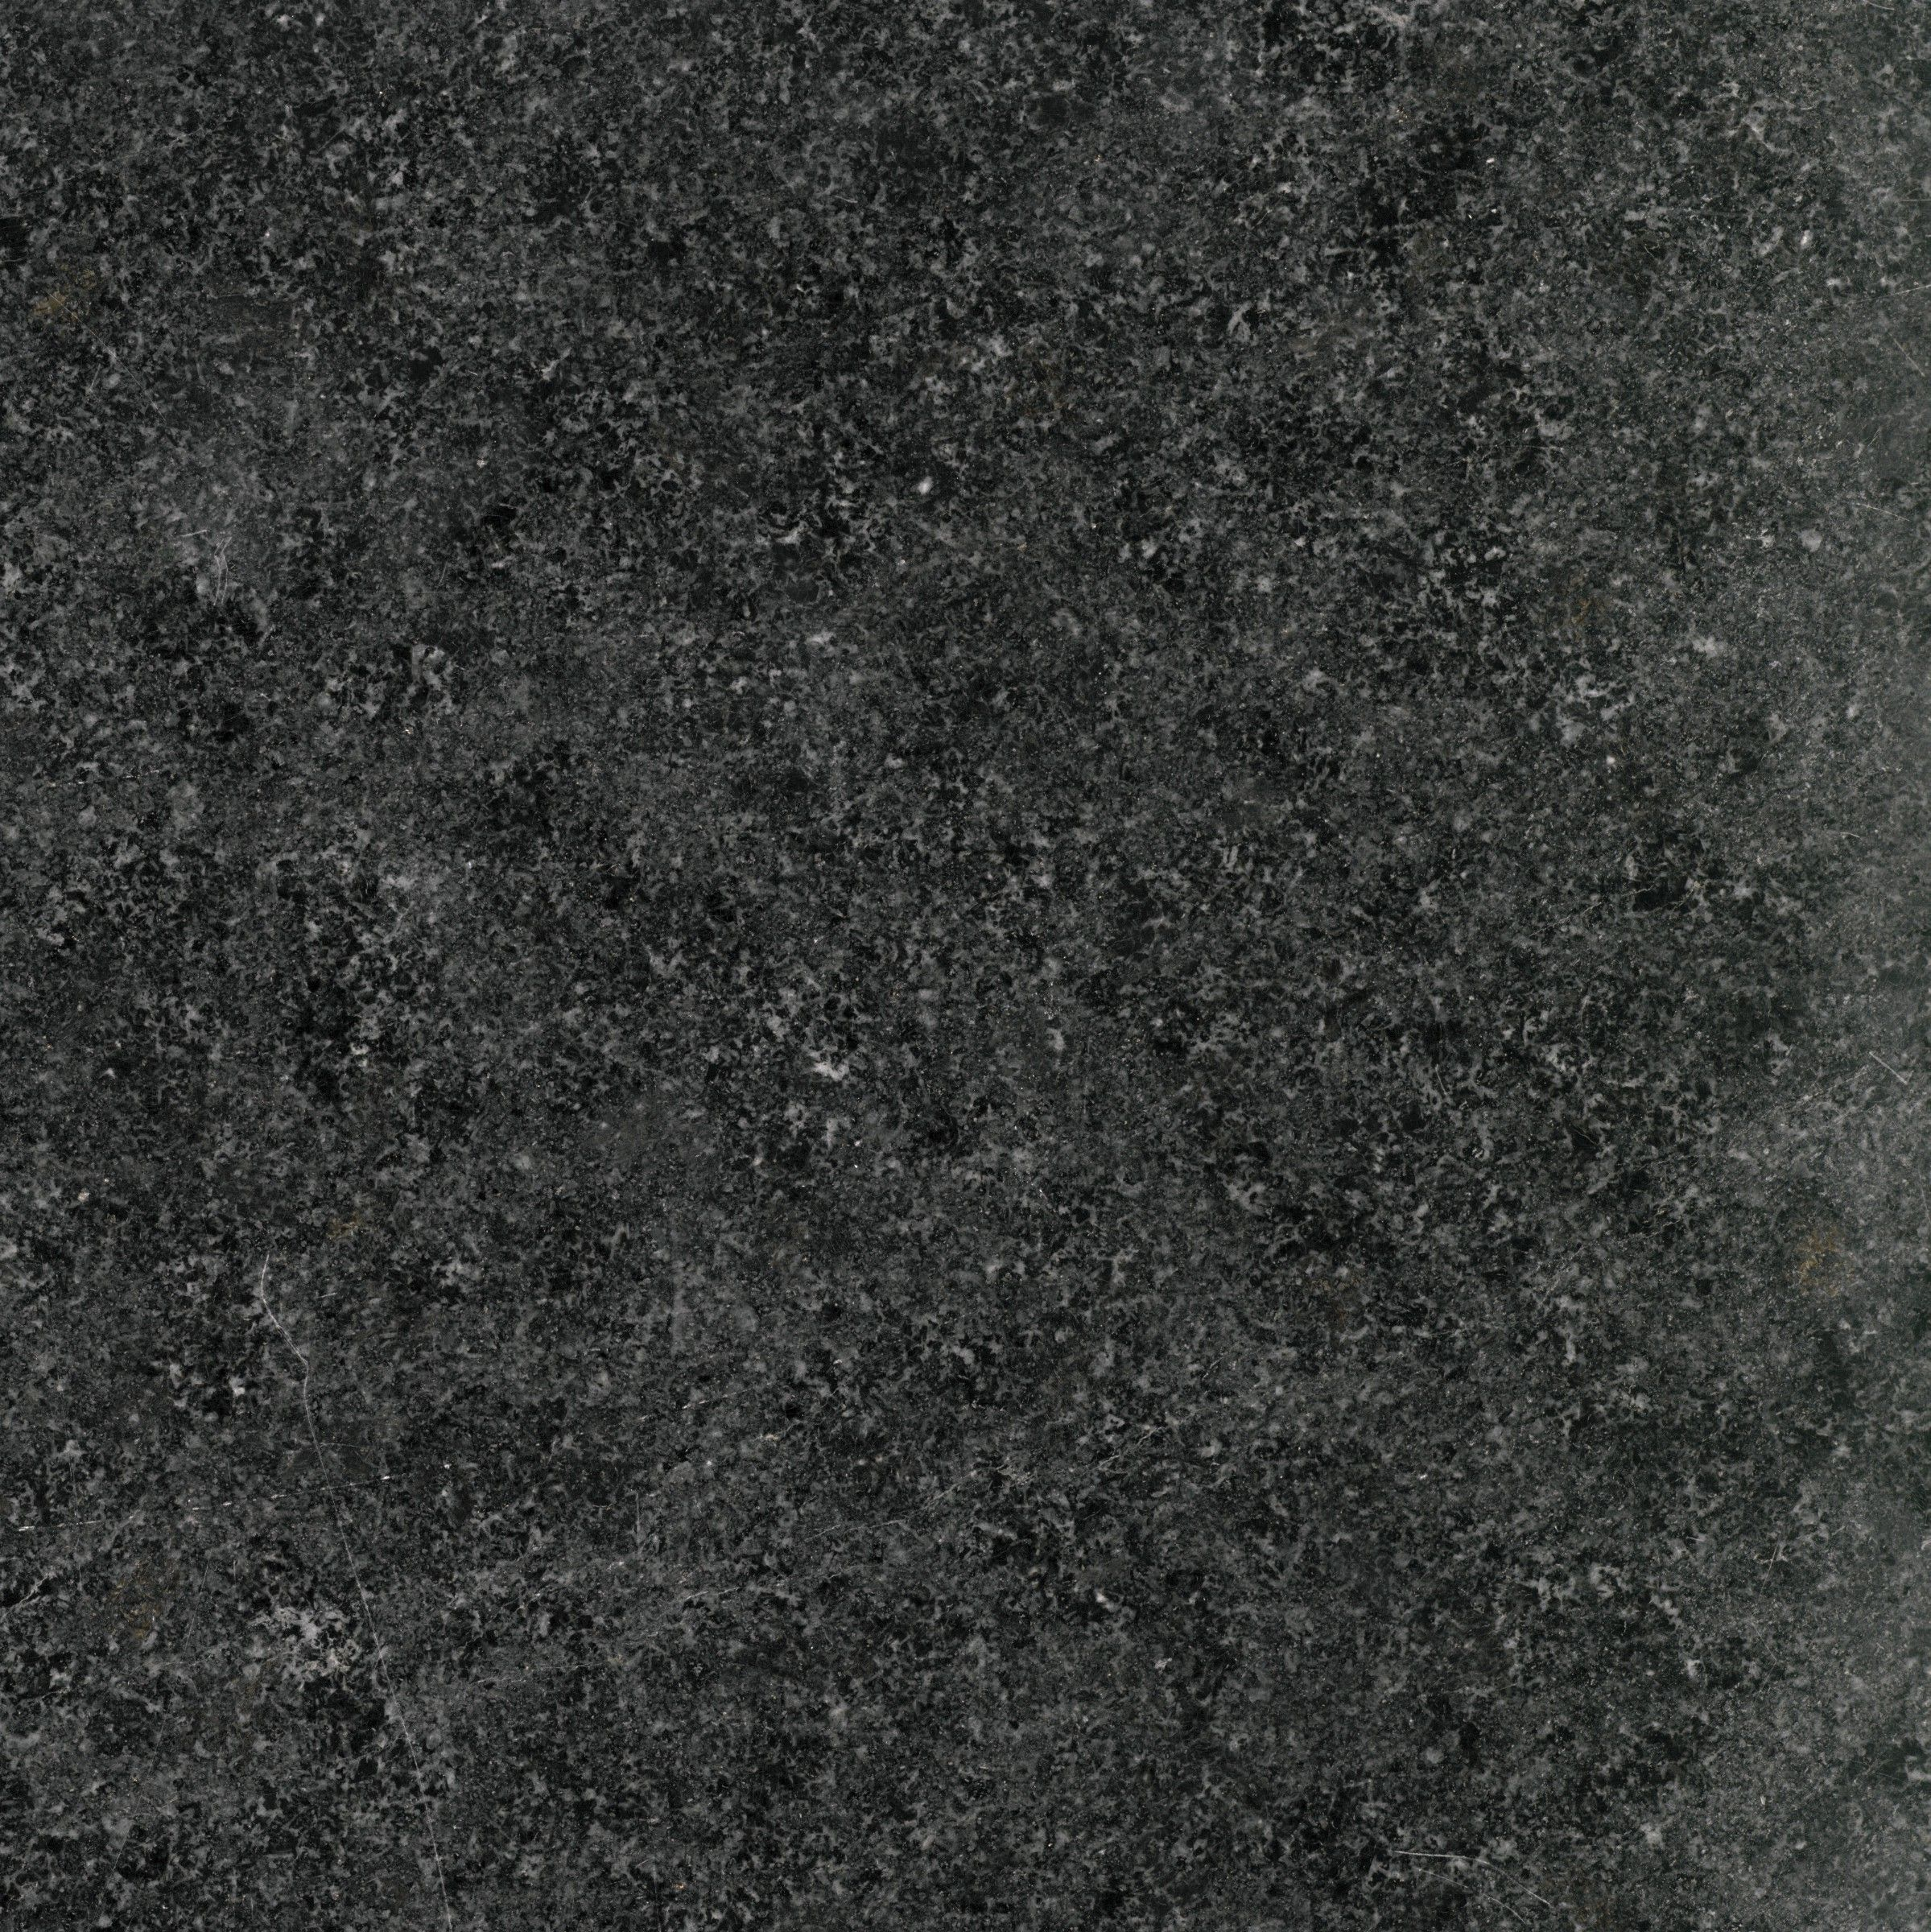 polished black granite texture. Polished Black Granite Texture Inspiration Decorating 315164 Other Ideas Design T